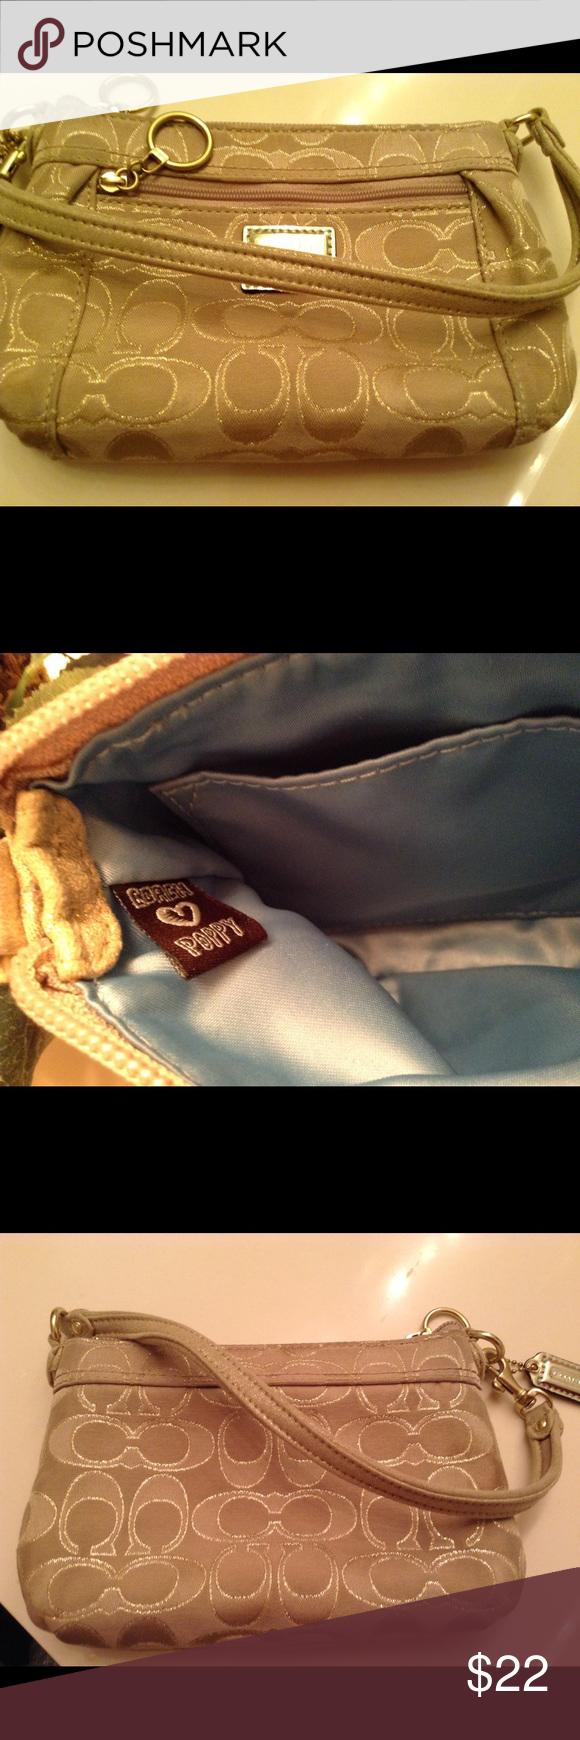 Coach mini purse Really cute small mini purse in good condition Coach Bags Mini Bags